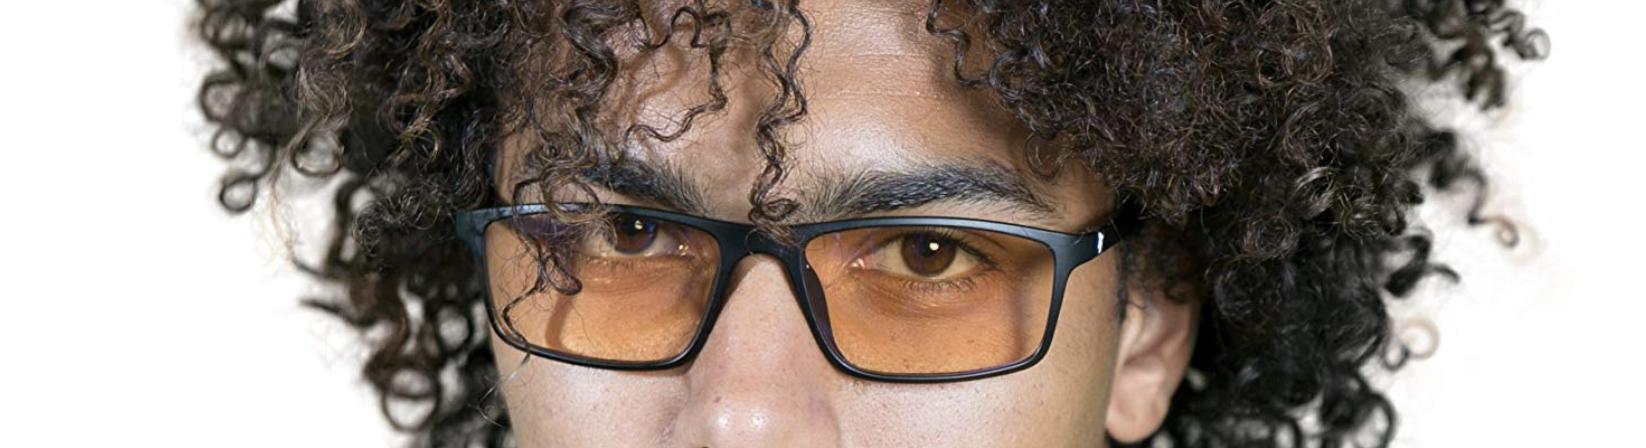 gunnar computer glasses